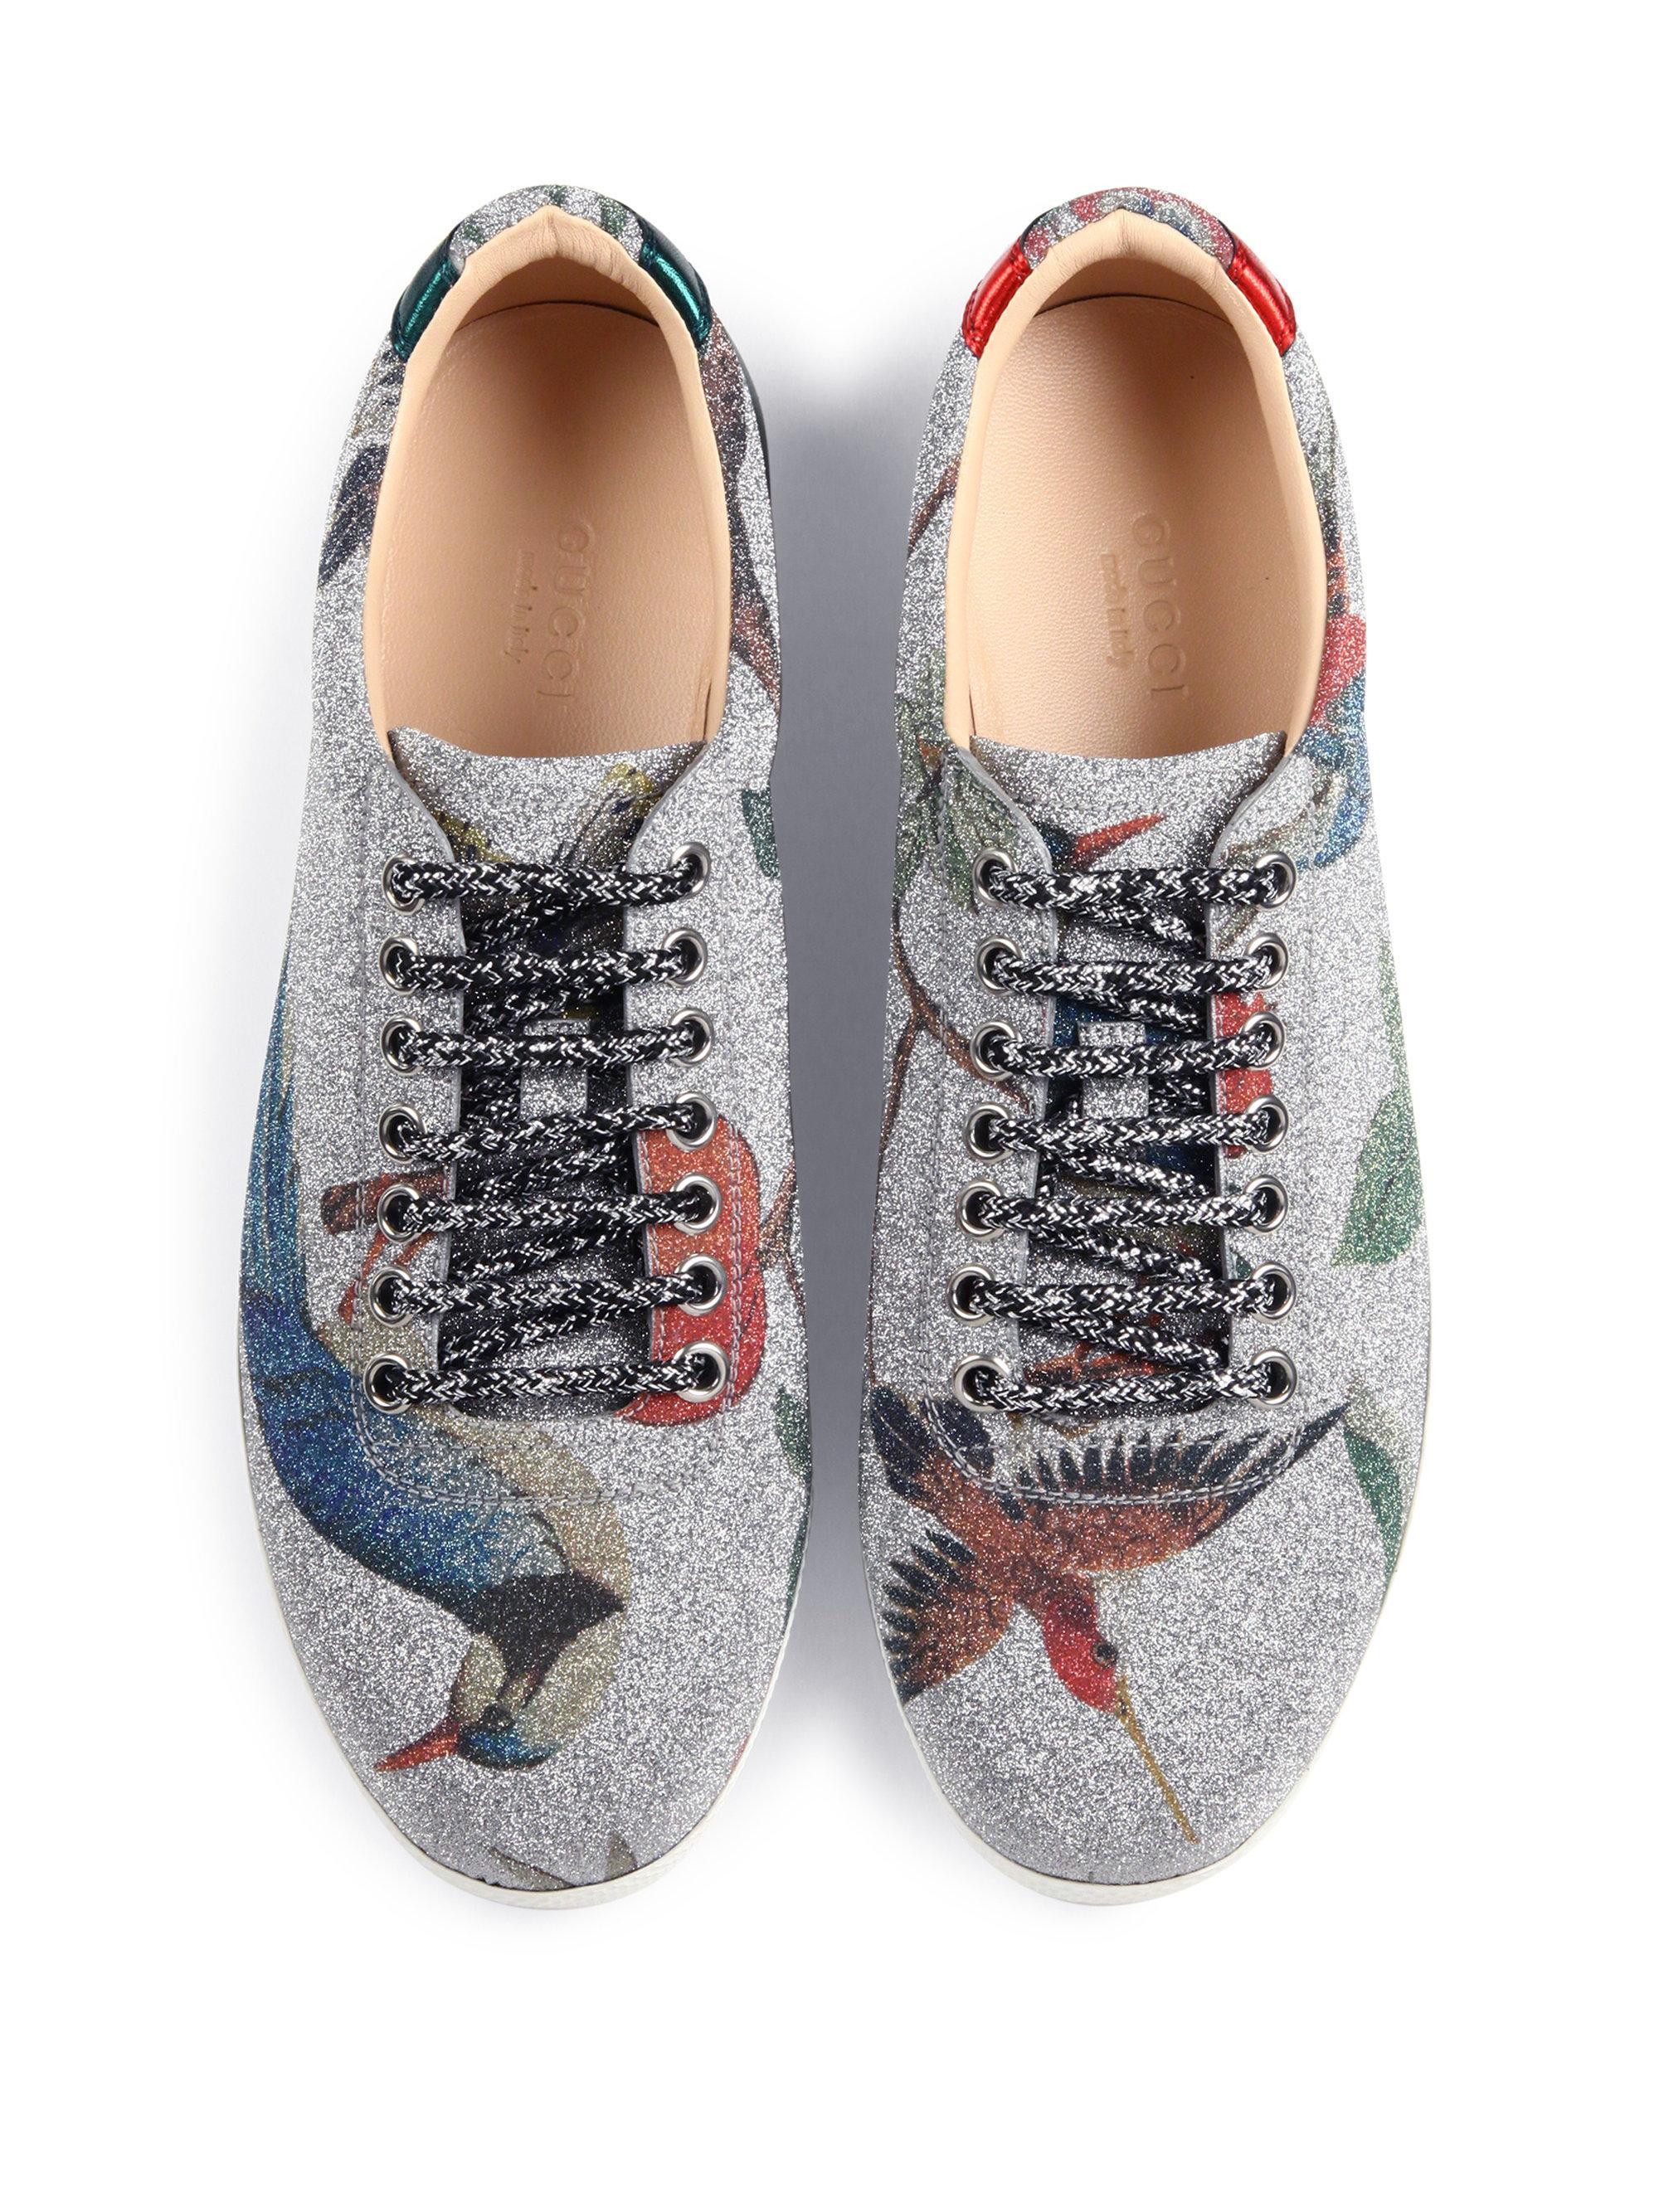 07ce4f8ab5f5d Lyst - Gucci Bambi Tian-print Glitter Sneakers in Gray